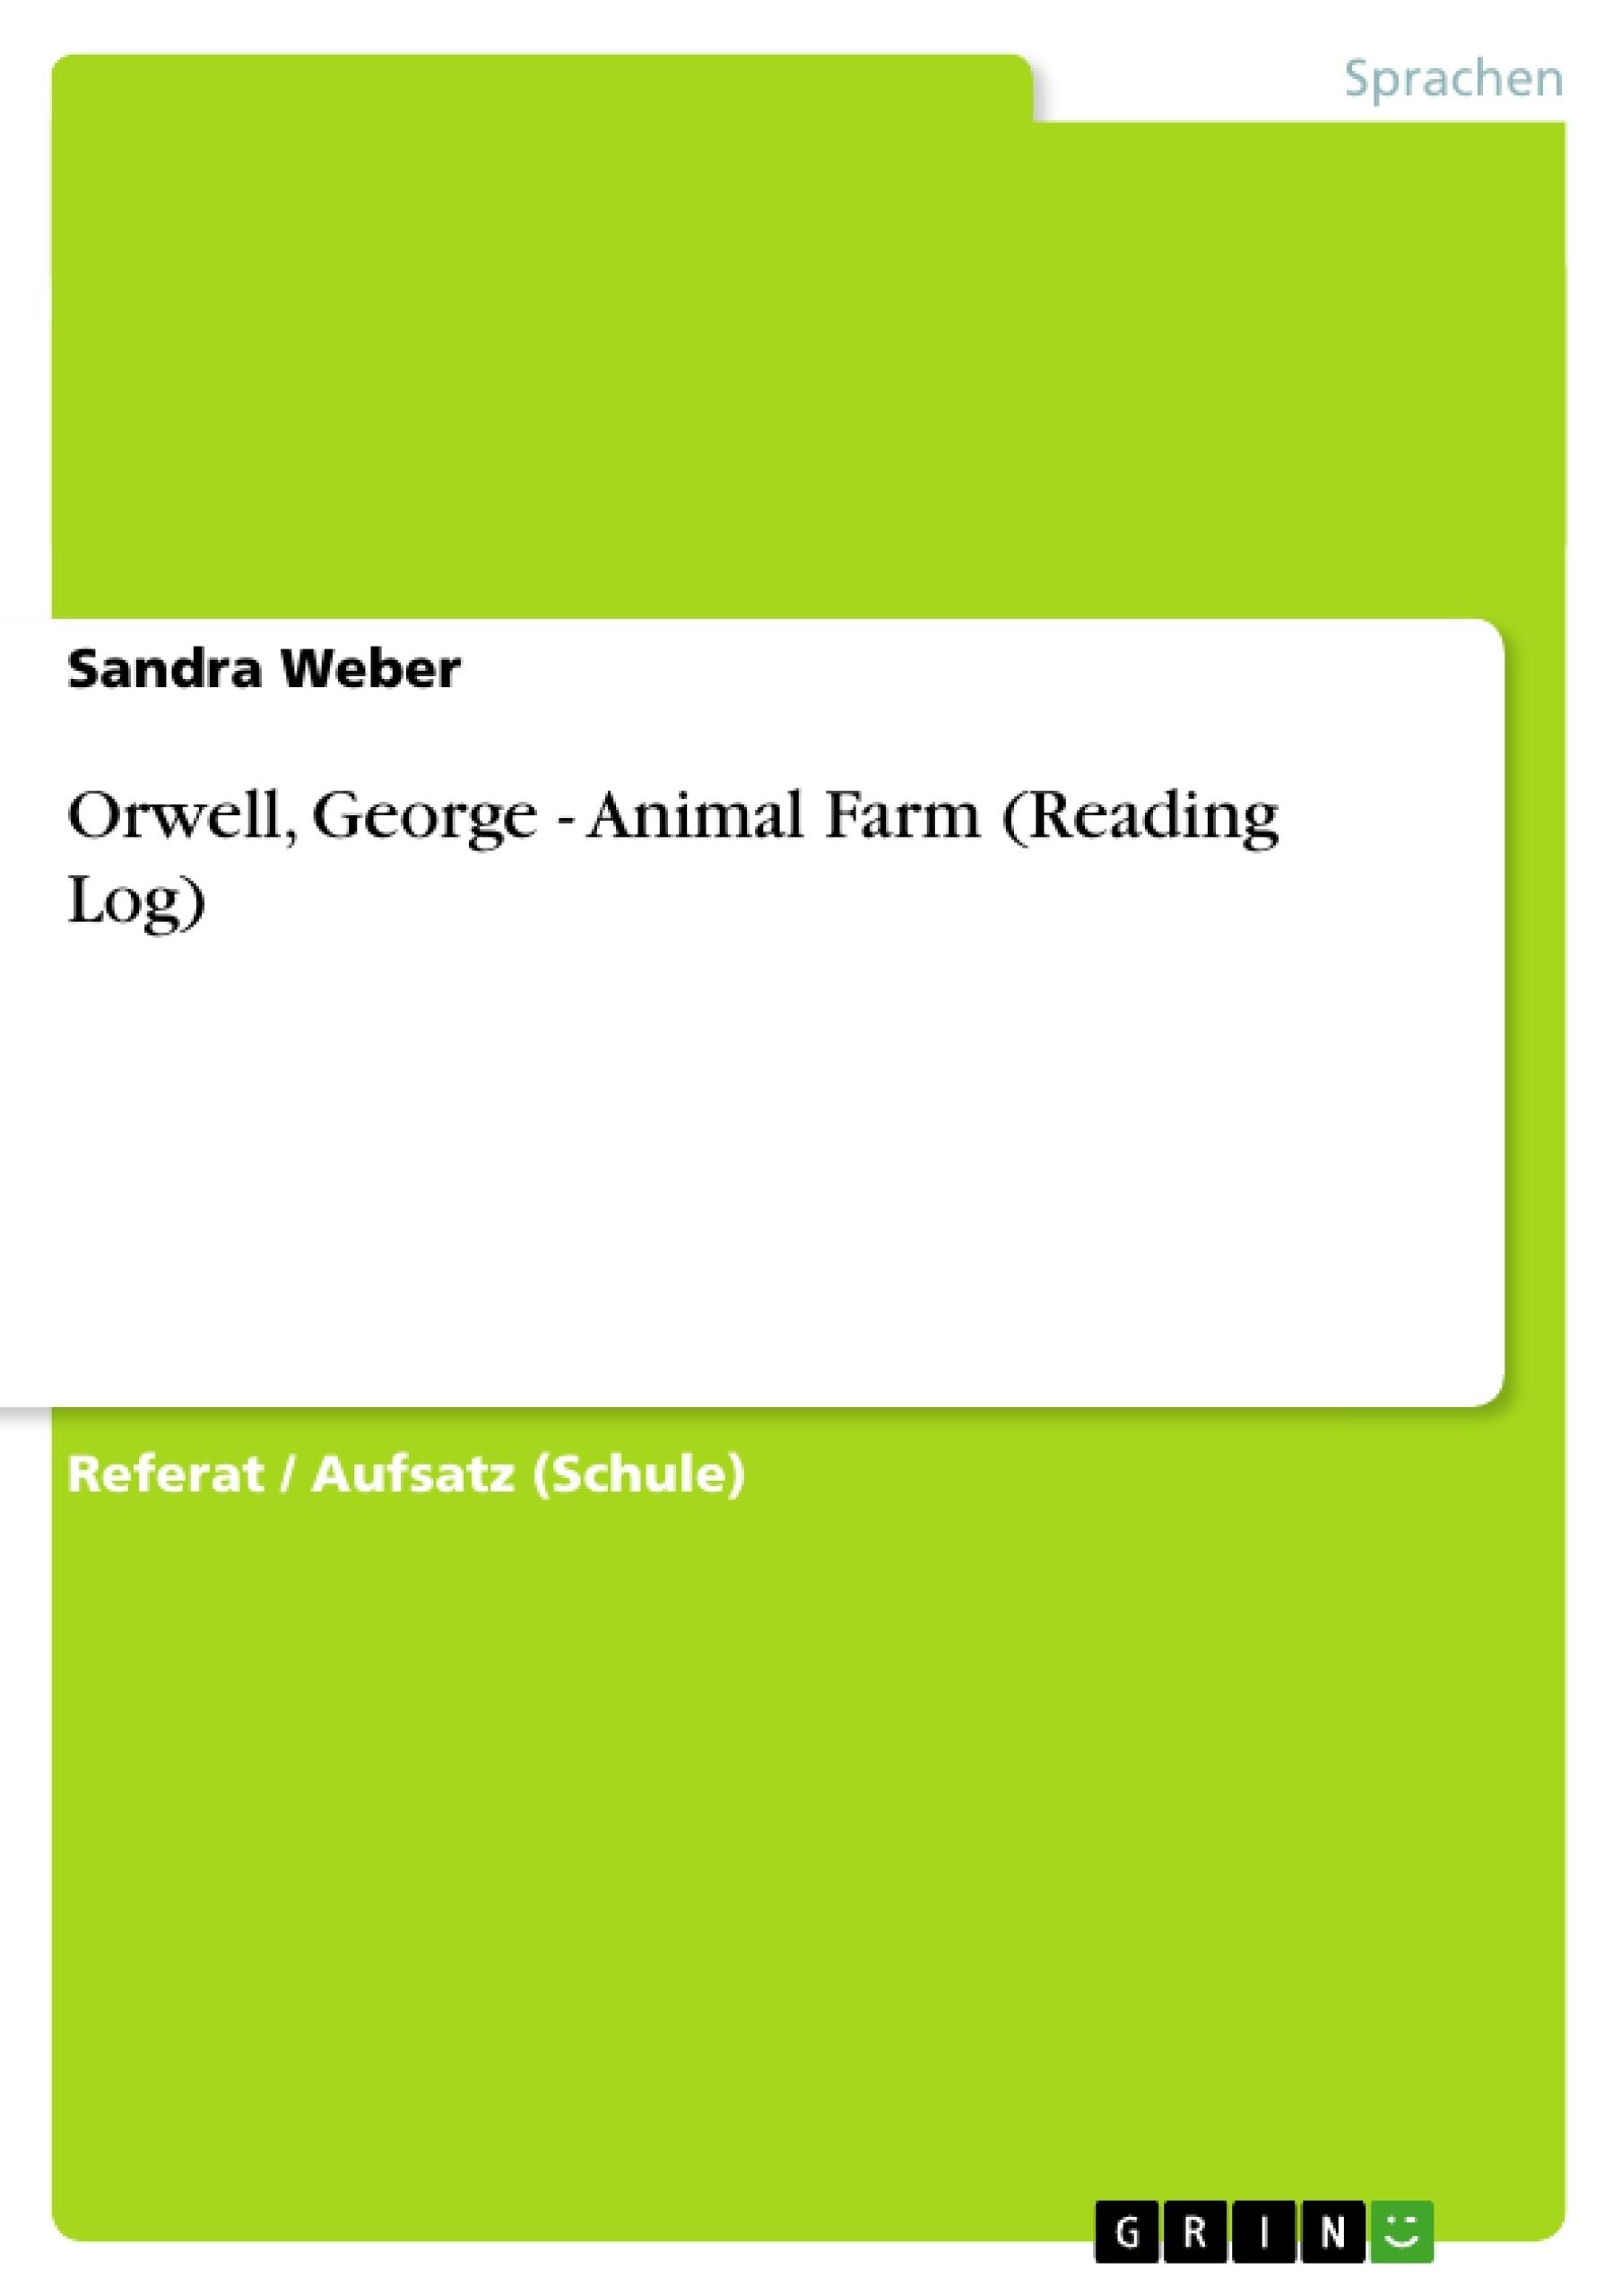 Titel: Orwell, George - Animal Farm (Reading Log)